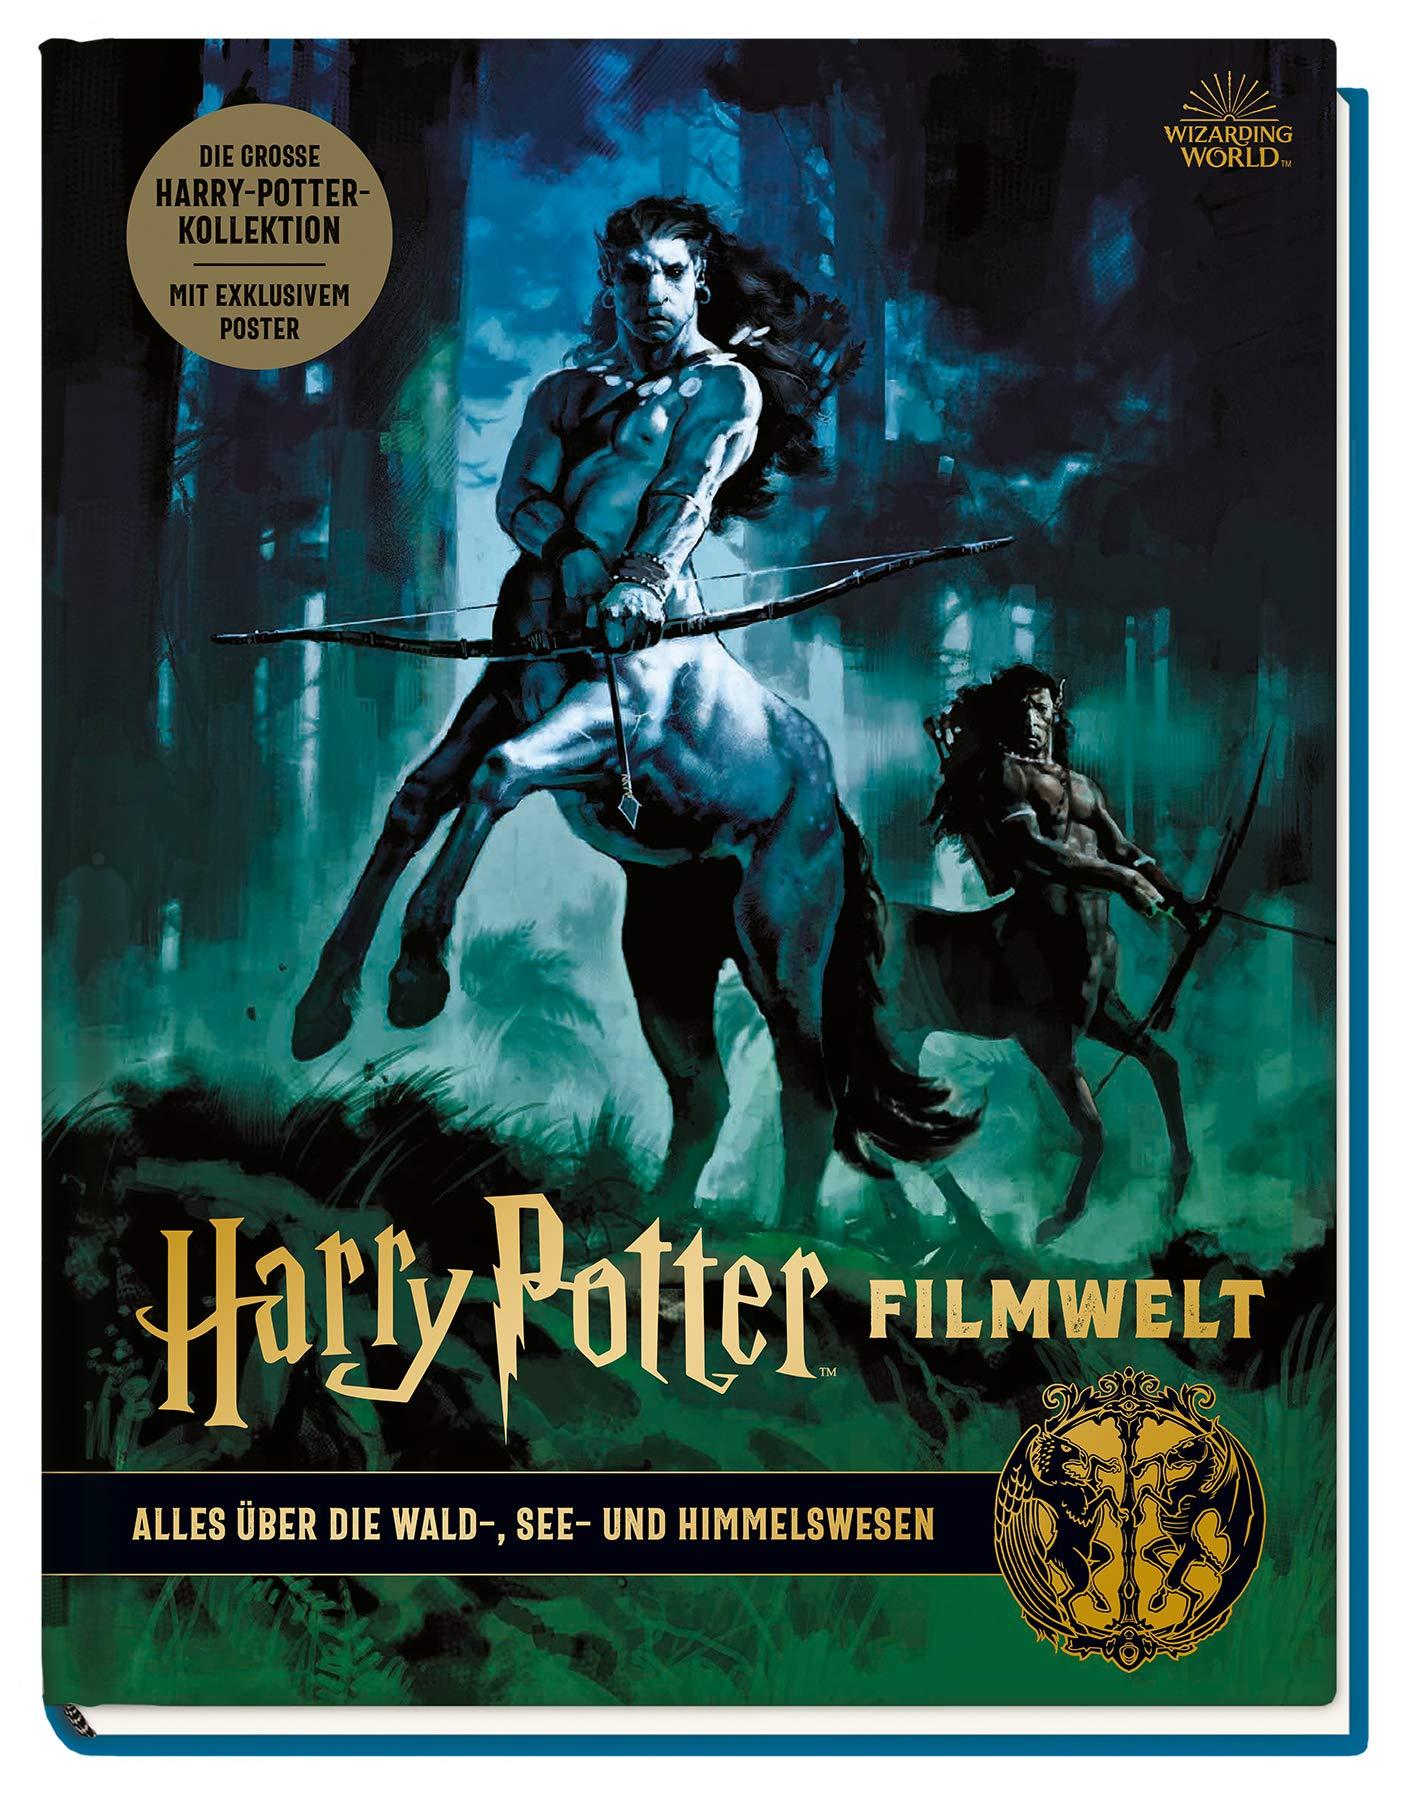 Harry Potter Filmwelt Bd 1 Alles Uber Die Wald See Und Himmelswesen Revenson Jody 9783833238130 Amazon Com Books